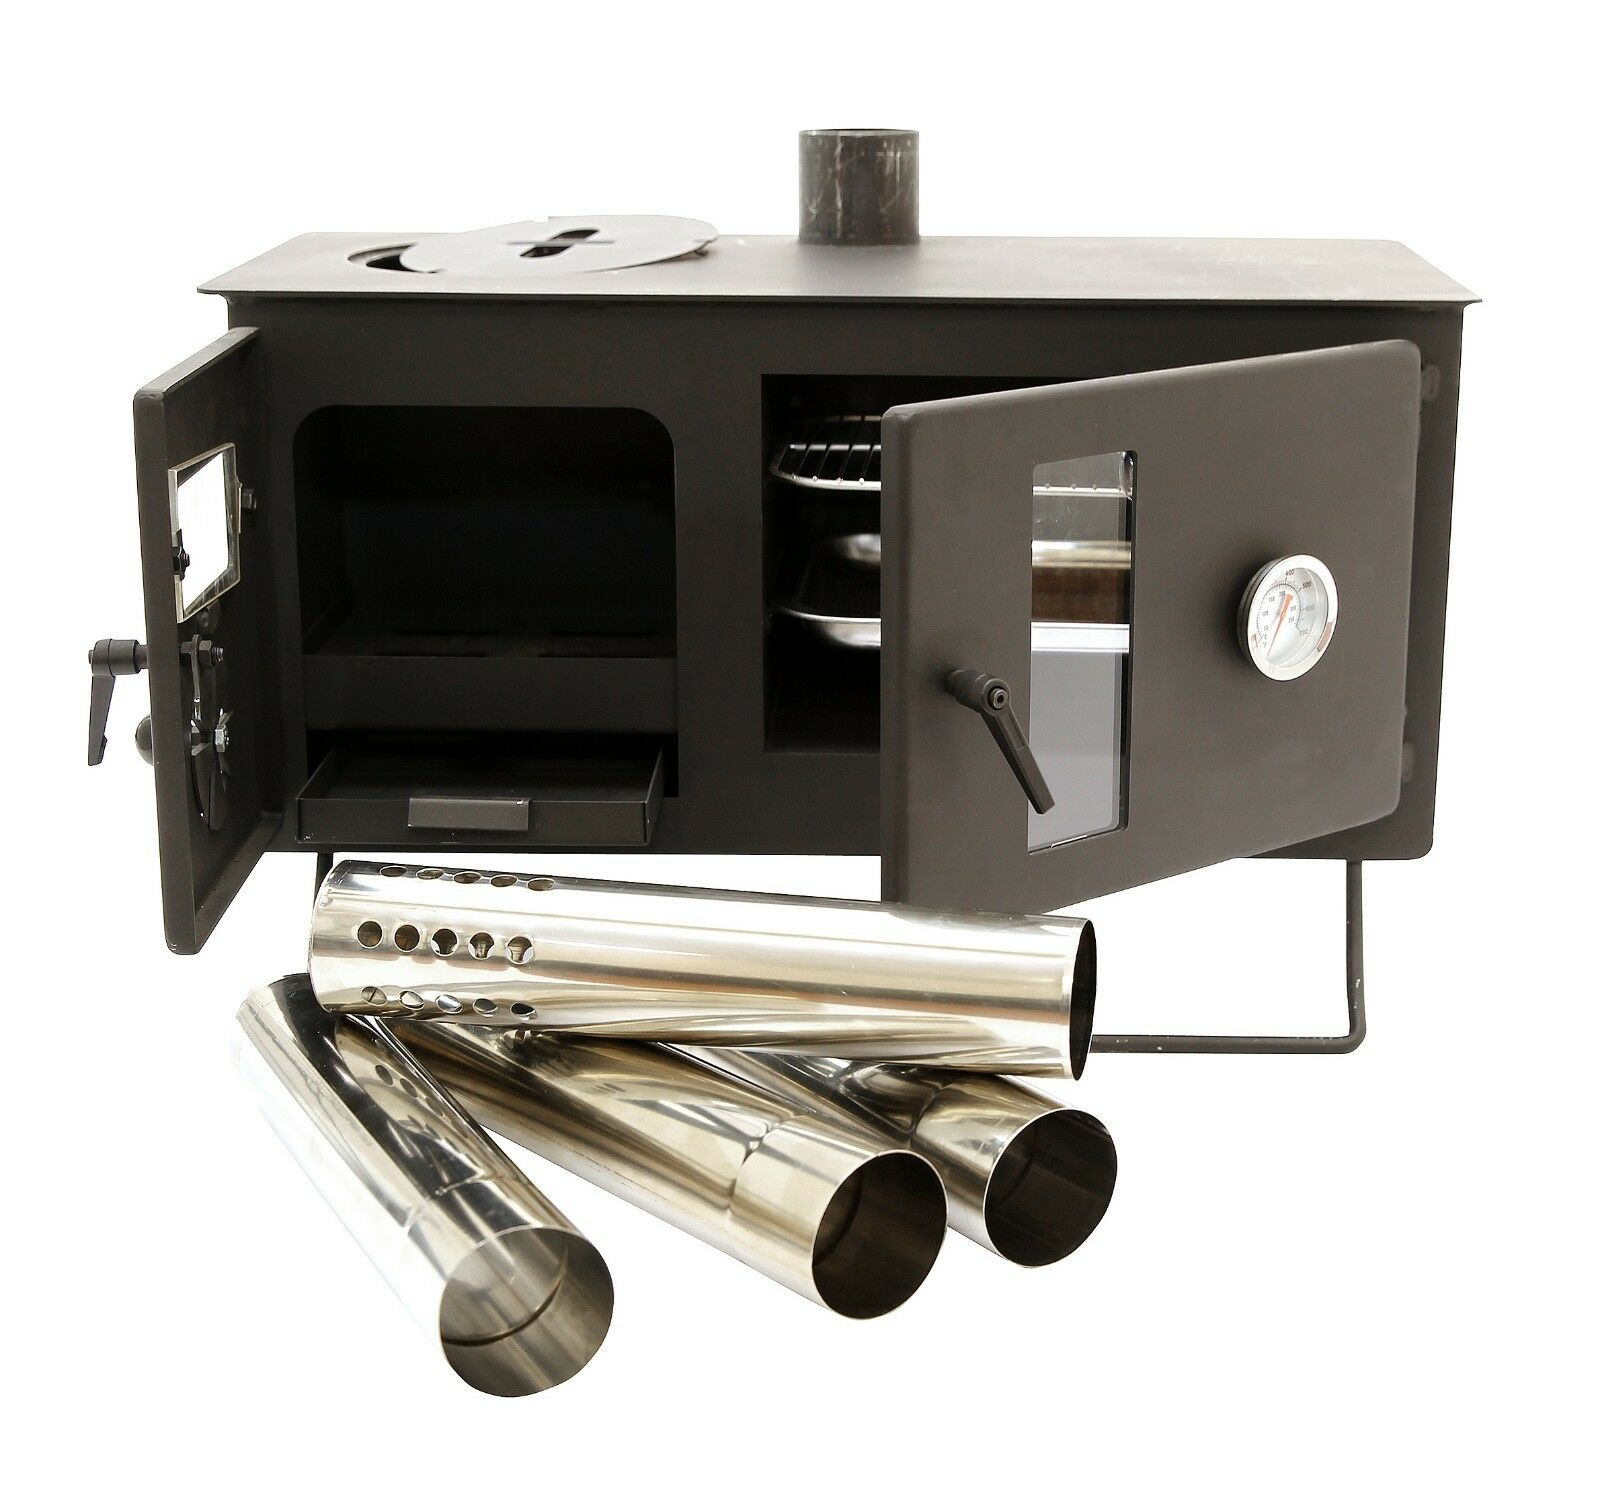 Large Window Firebox Tent Stove Outbacker/® Vista